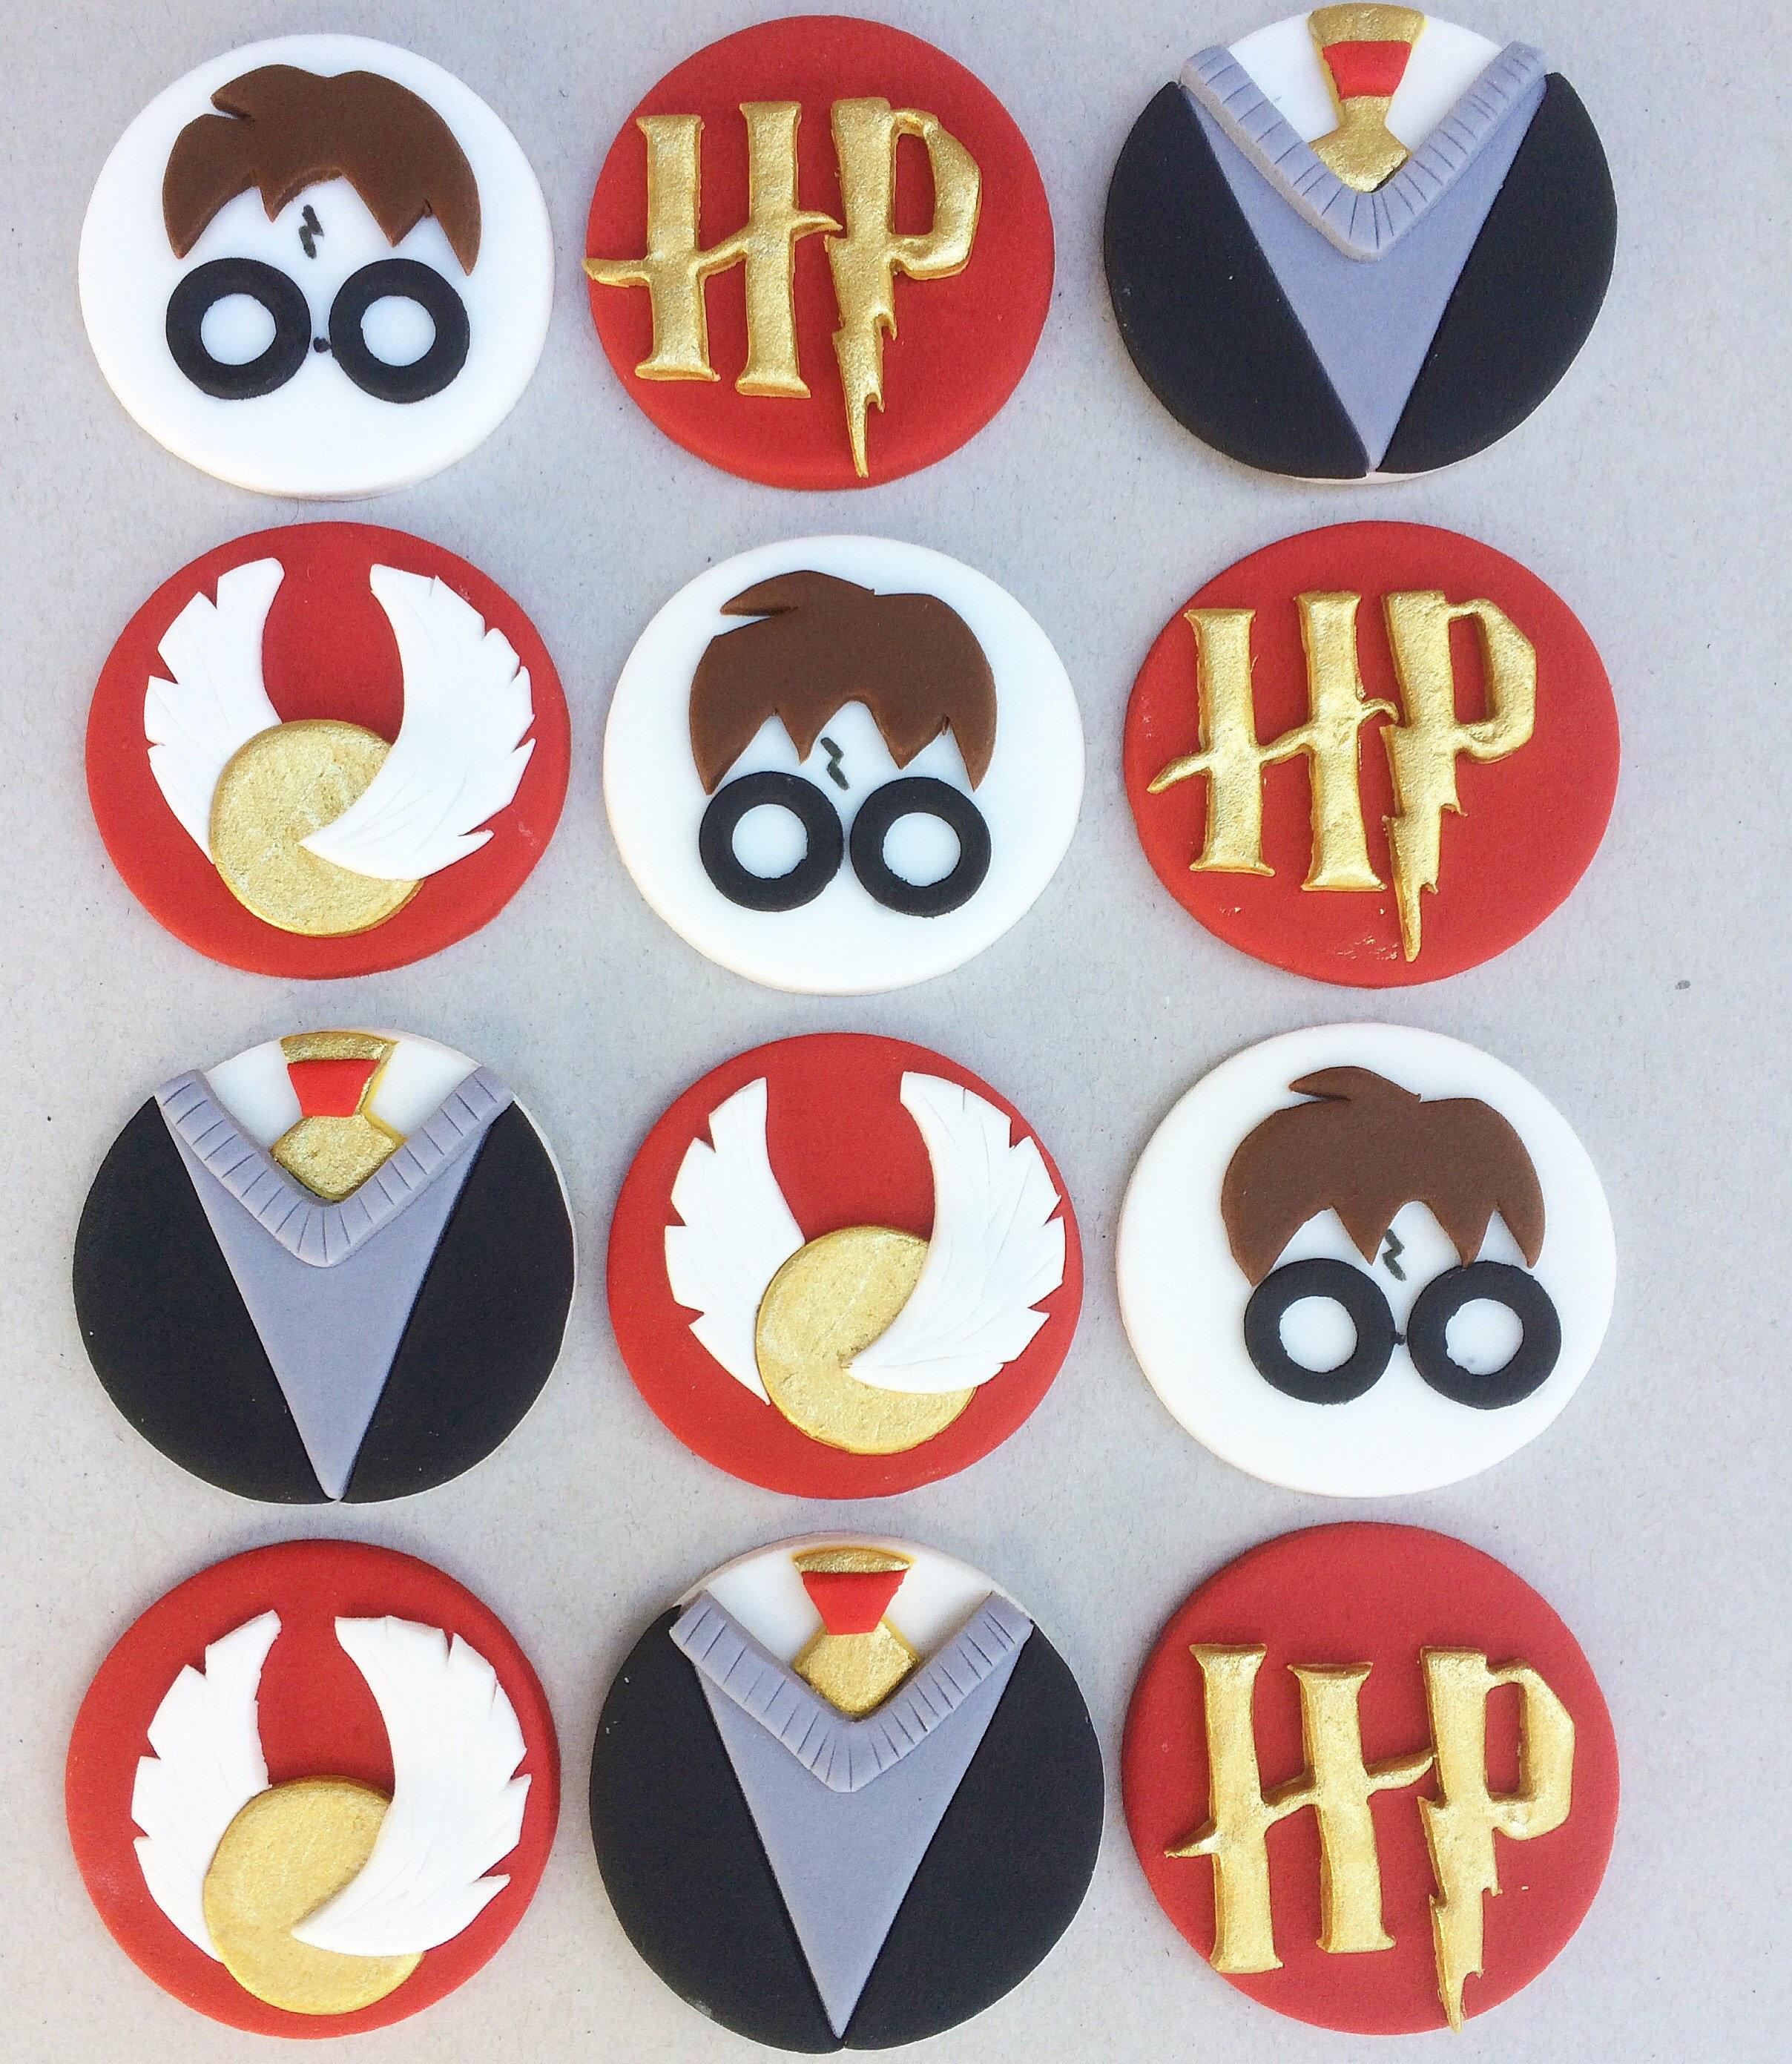 12 Harry Potter Fondant Cupcake Toppers Harry Potter